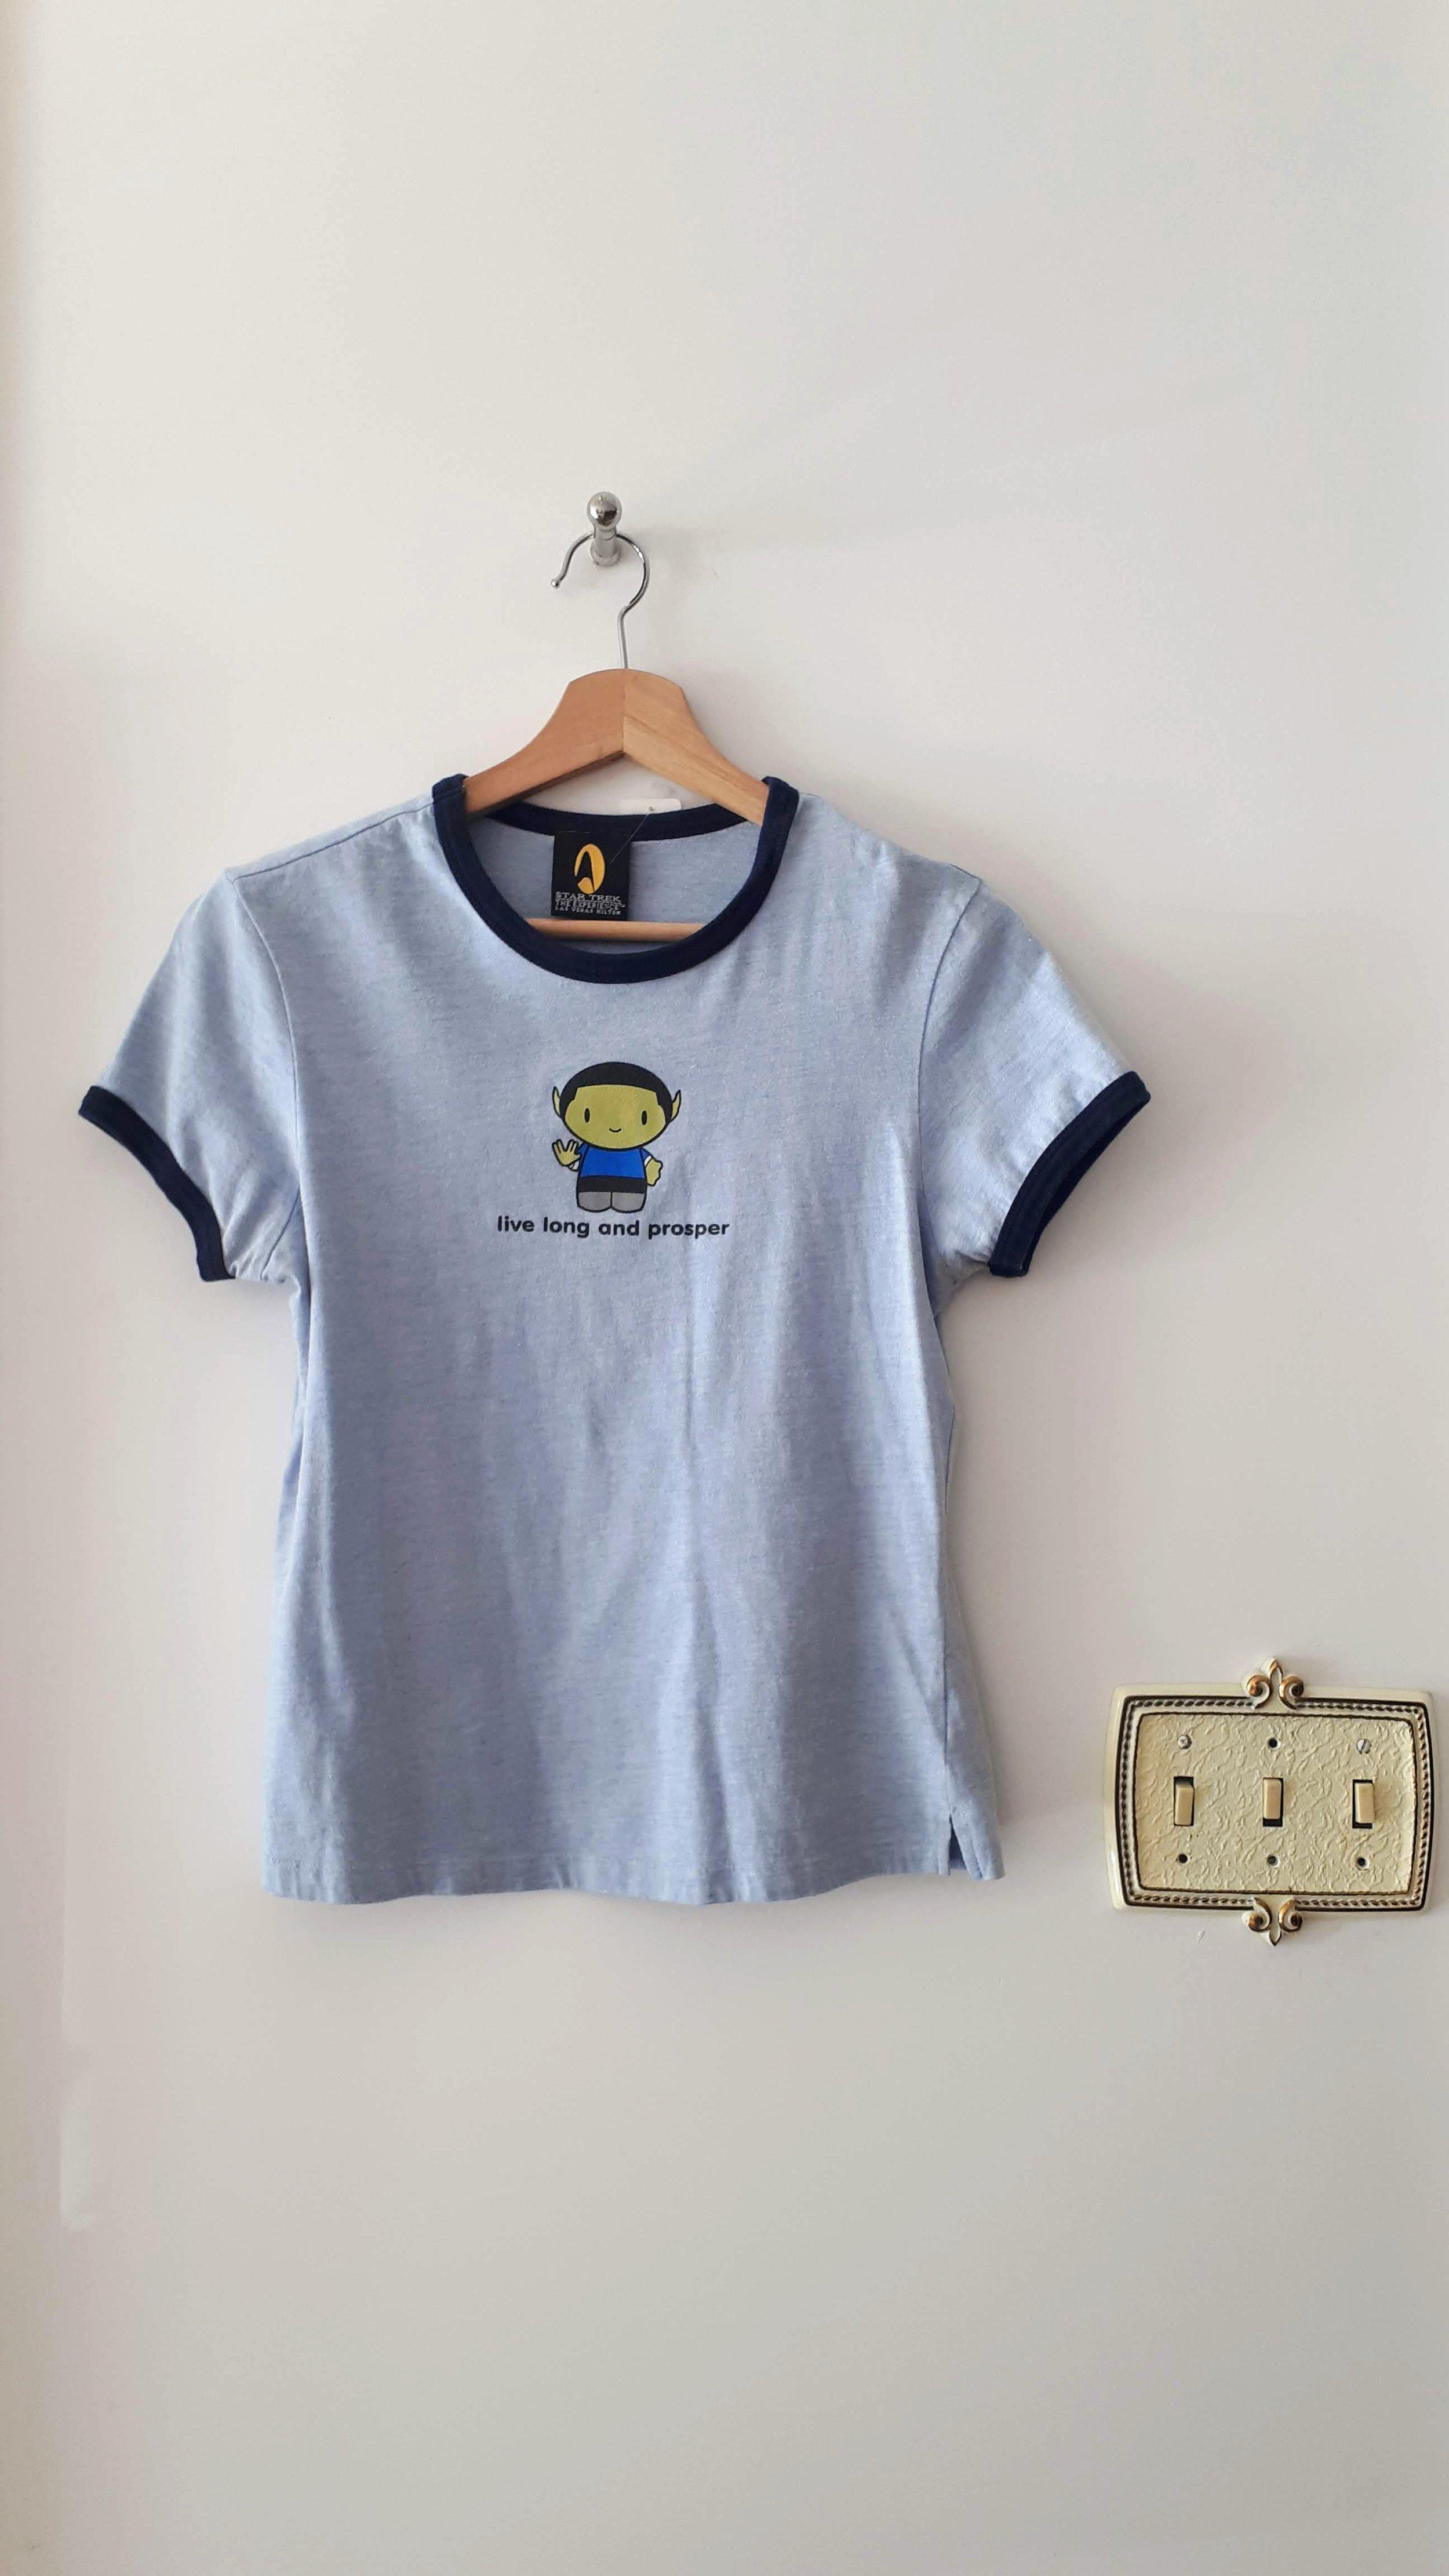 Tee shirt; Size M, $14